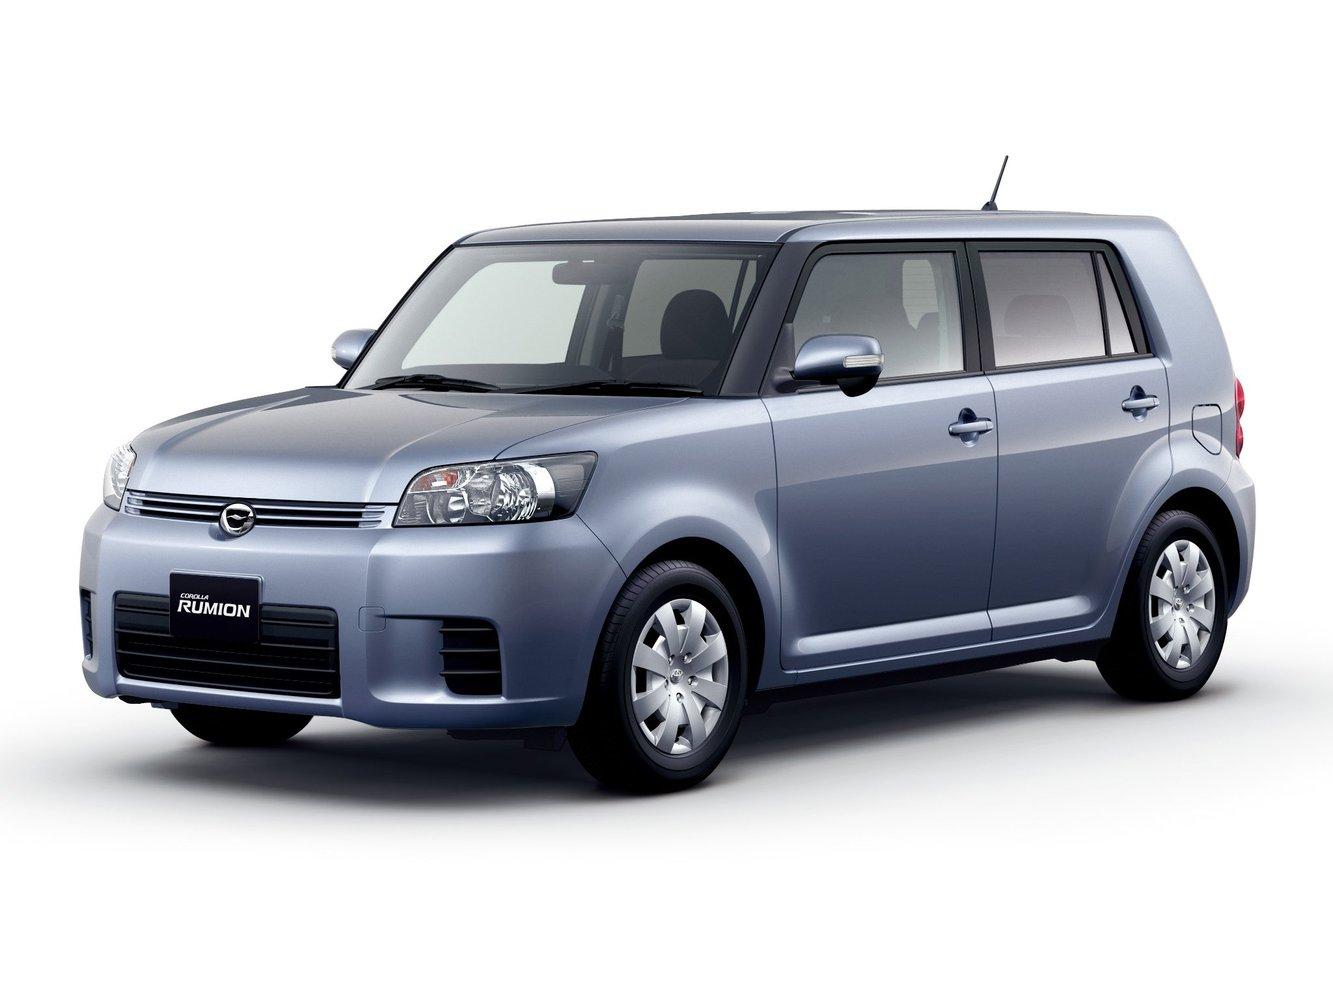 toyota Toyota Corolla Rumion